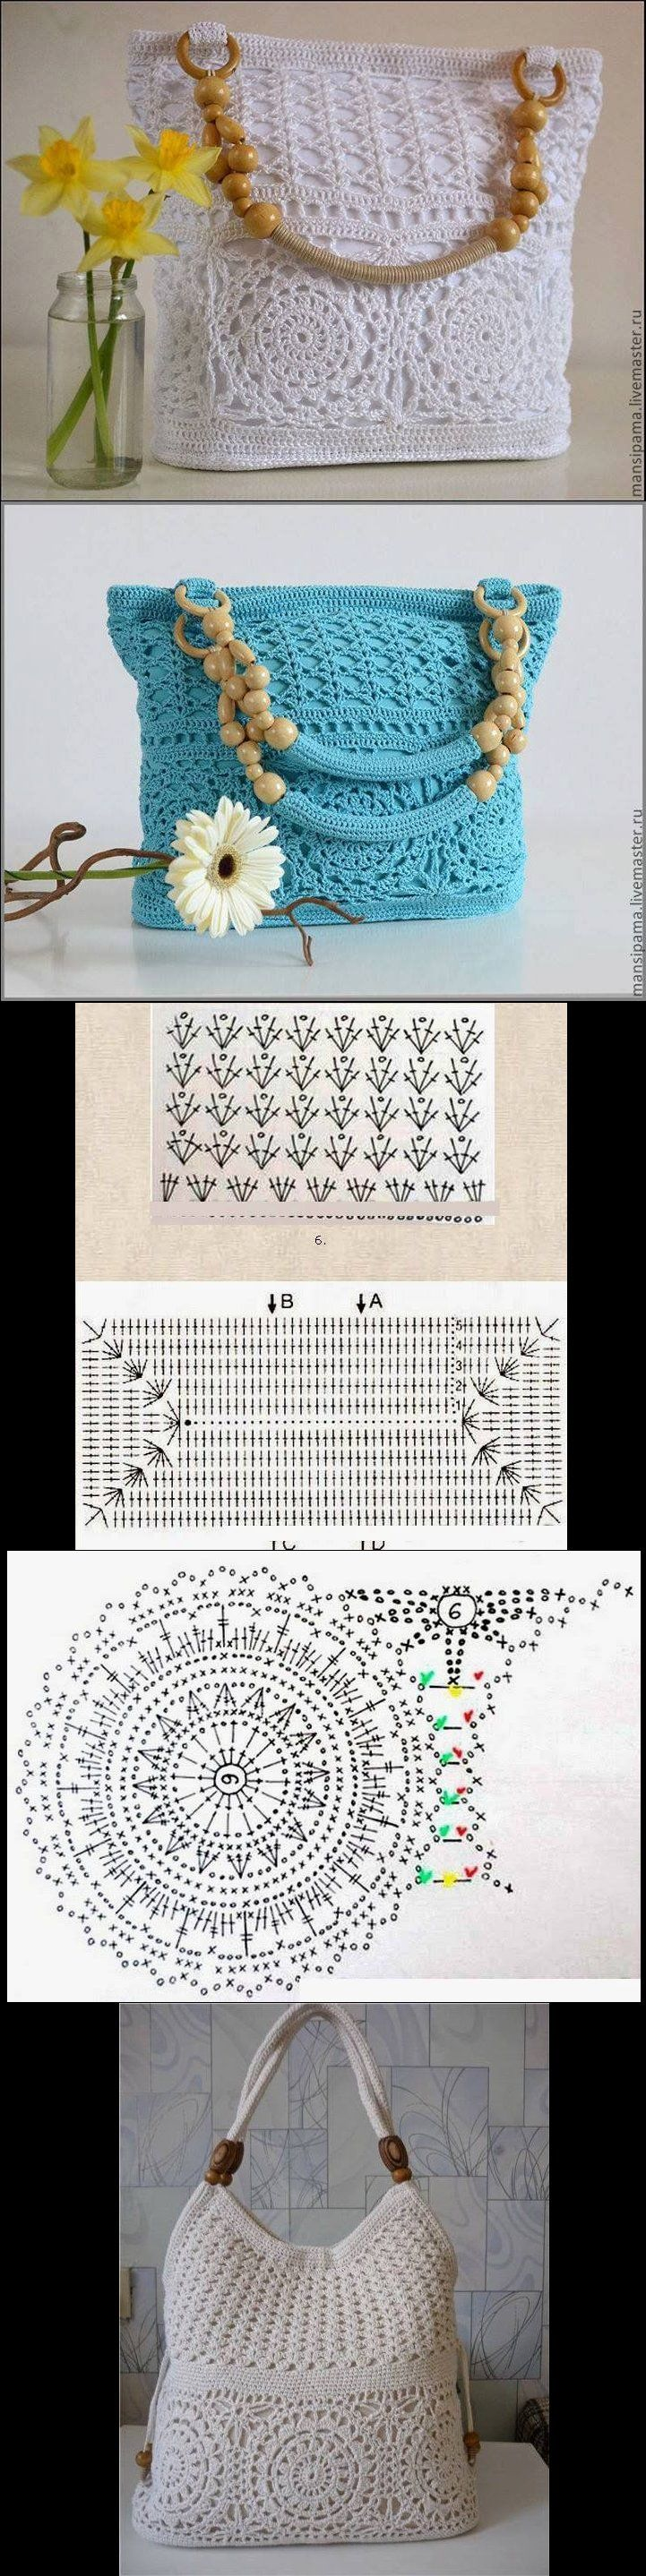 Bolsos | Crochet | Bolsos | Pinterest | Bolsos, Tejido y Ganchillo